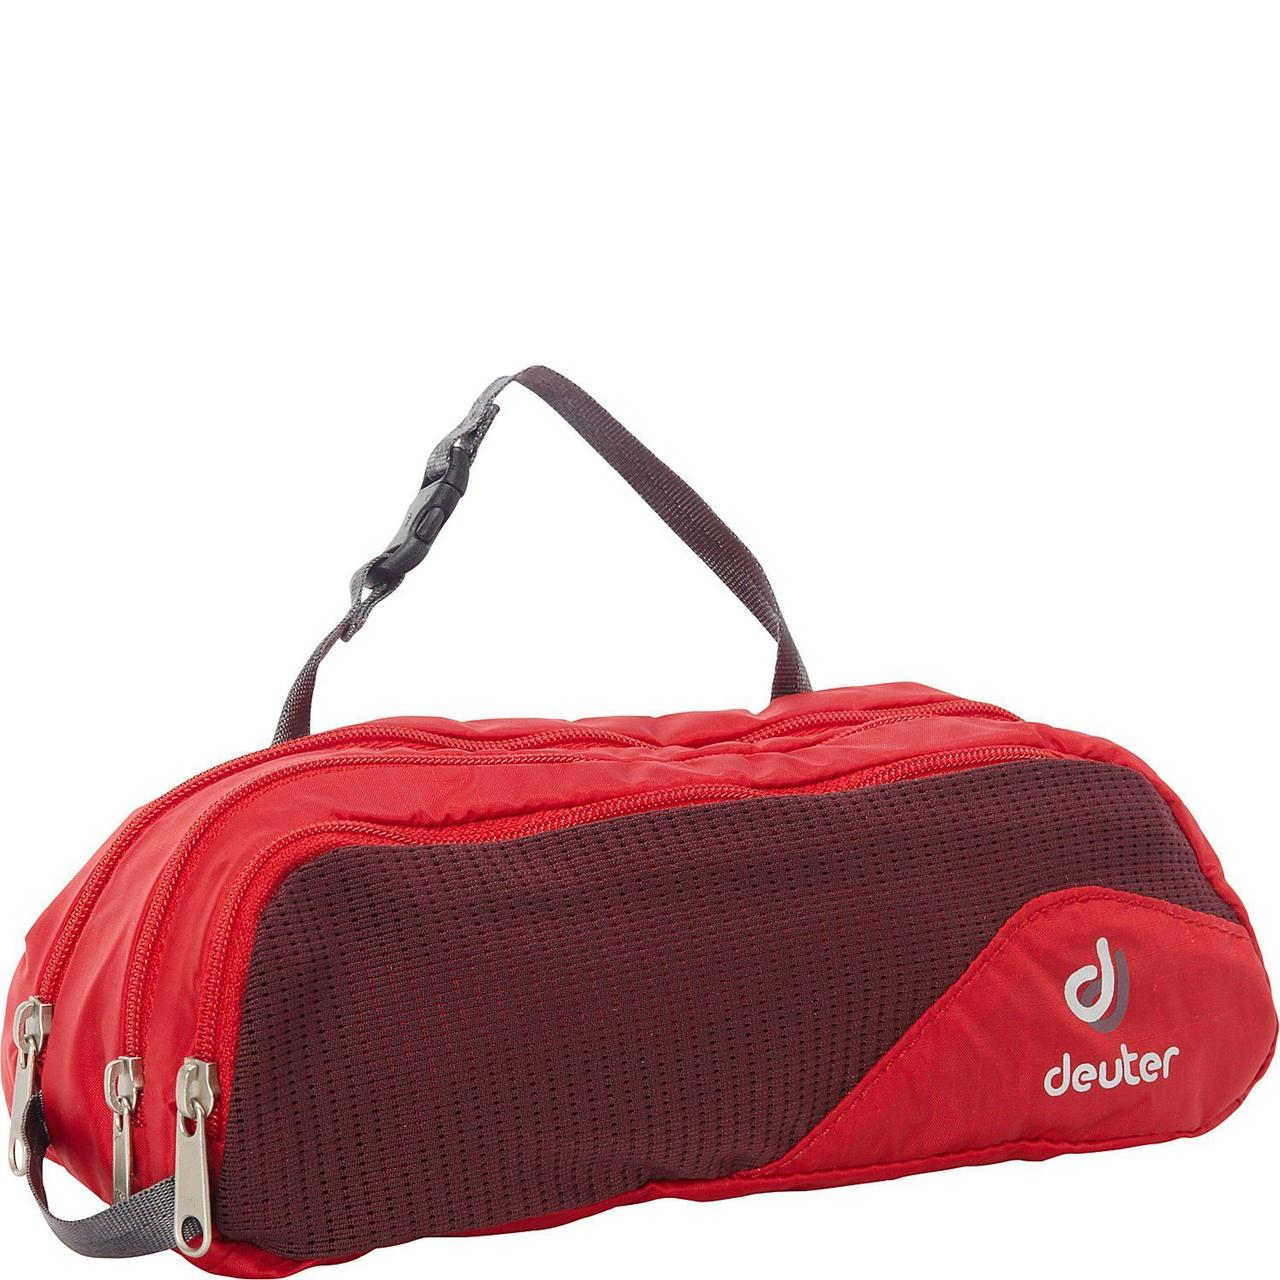 Несессер Deuter Wash Bag Tour II fire-aubergine (39492 5513)